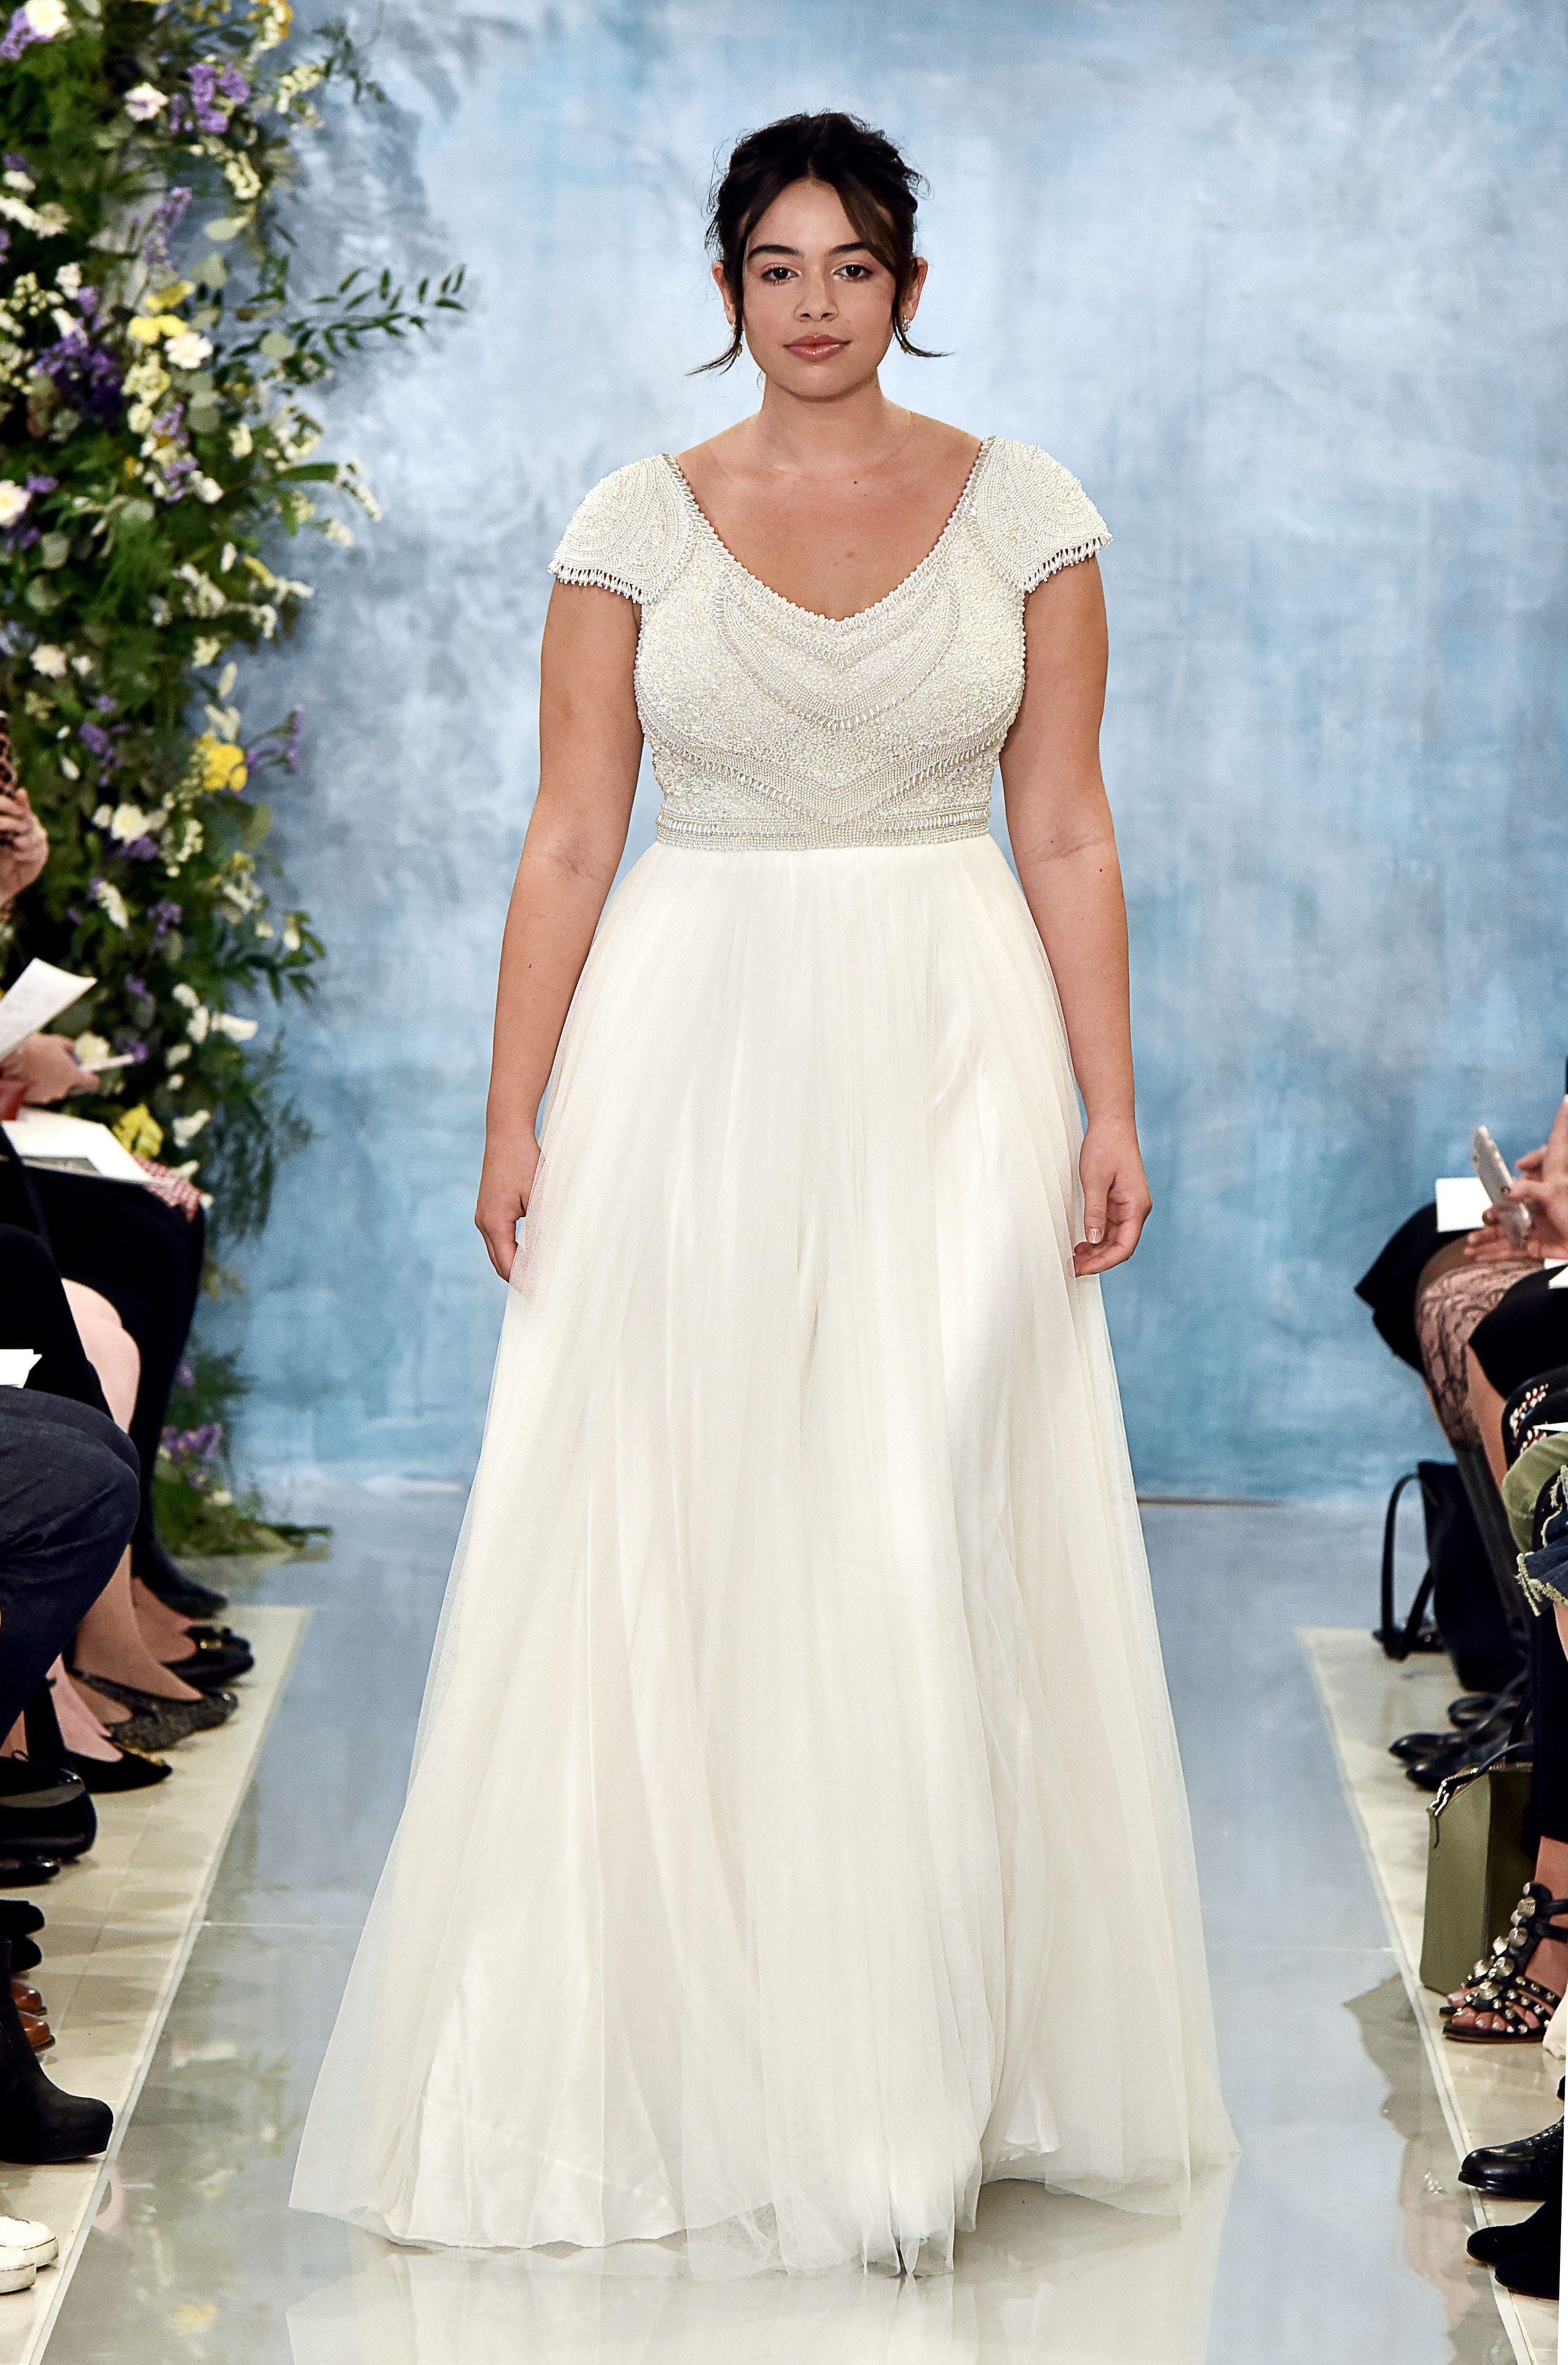 Theia bridal wedding dress collection fall 2018 brides someday theia bridal wedding dress collection fall 2018 brides junglespirit Gallery